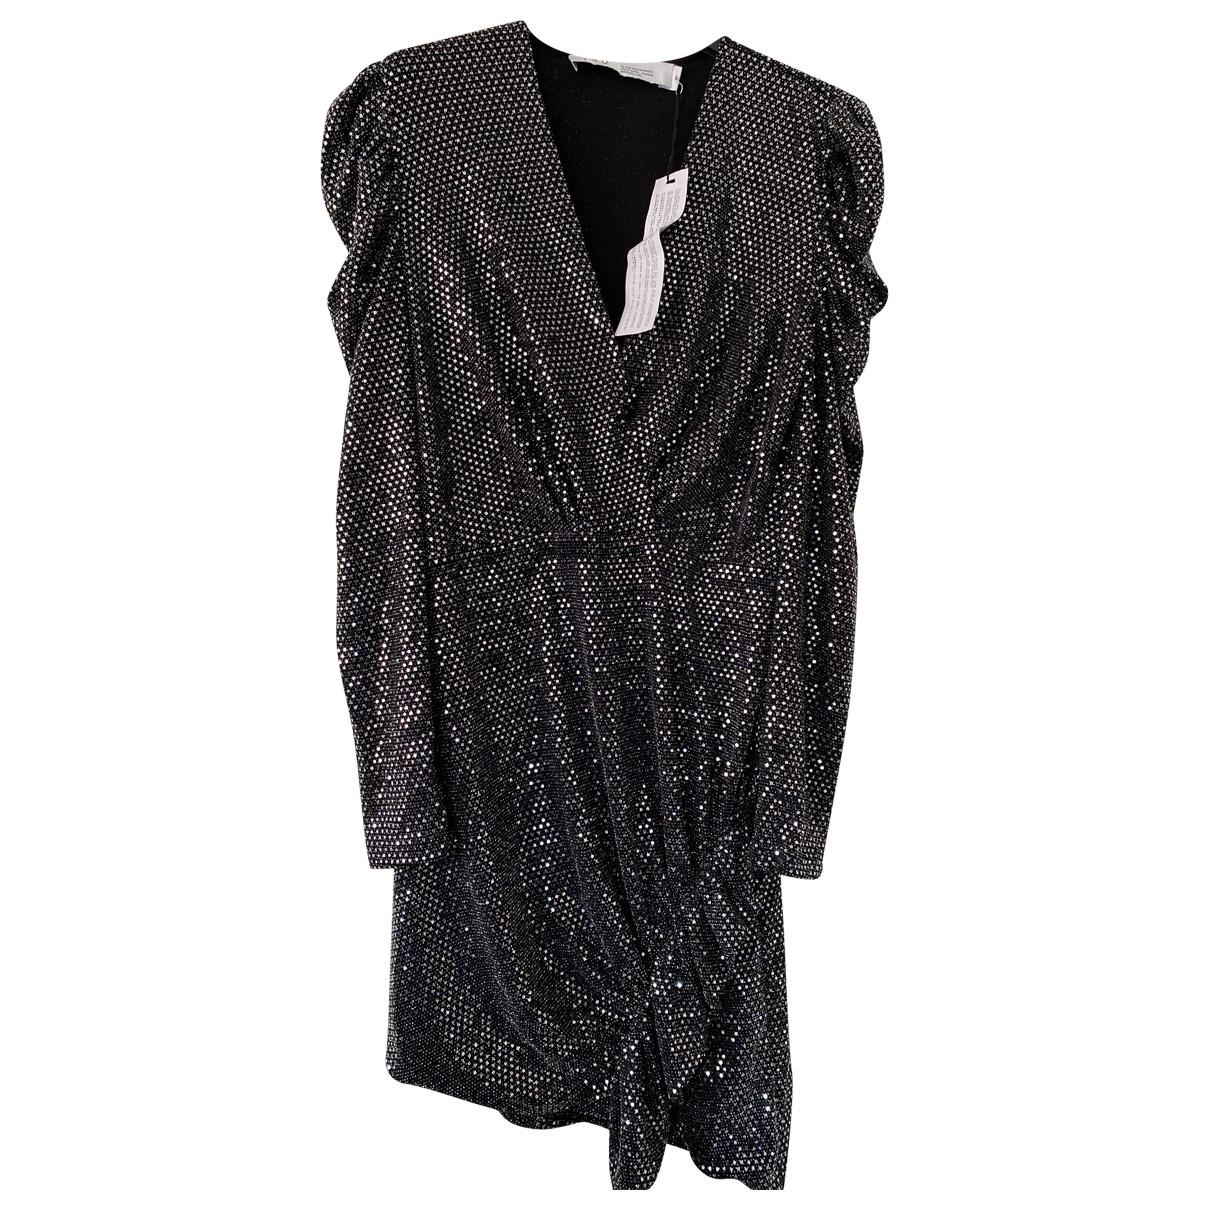 Iro Fall Winter 2019 Kleid in  Silber Mit Pailletten